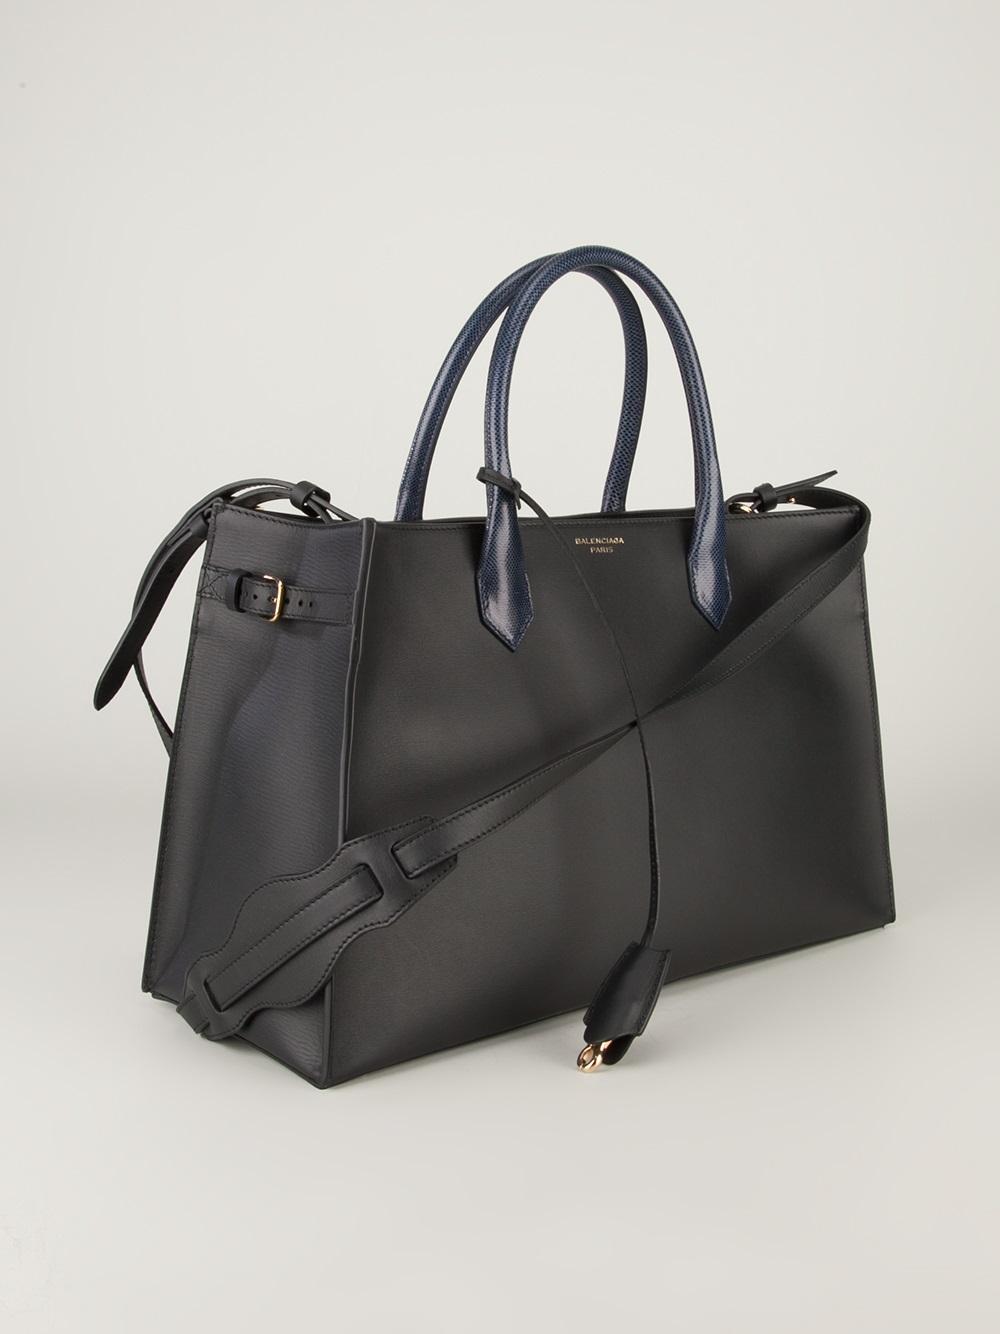 Balenciaga Black And White Bag. Balenciaga Tote Bag in Black  62498d8c0fcd2